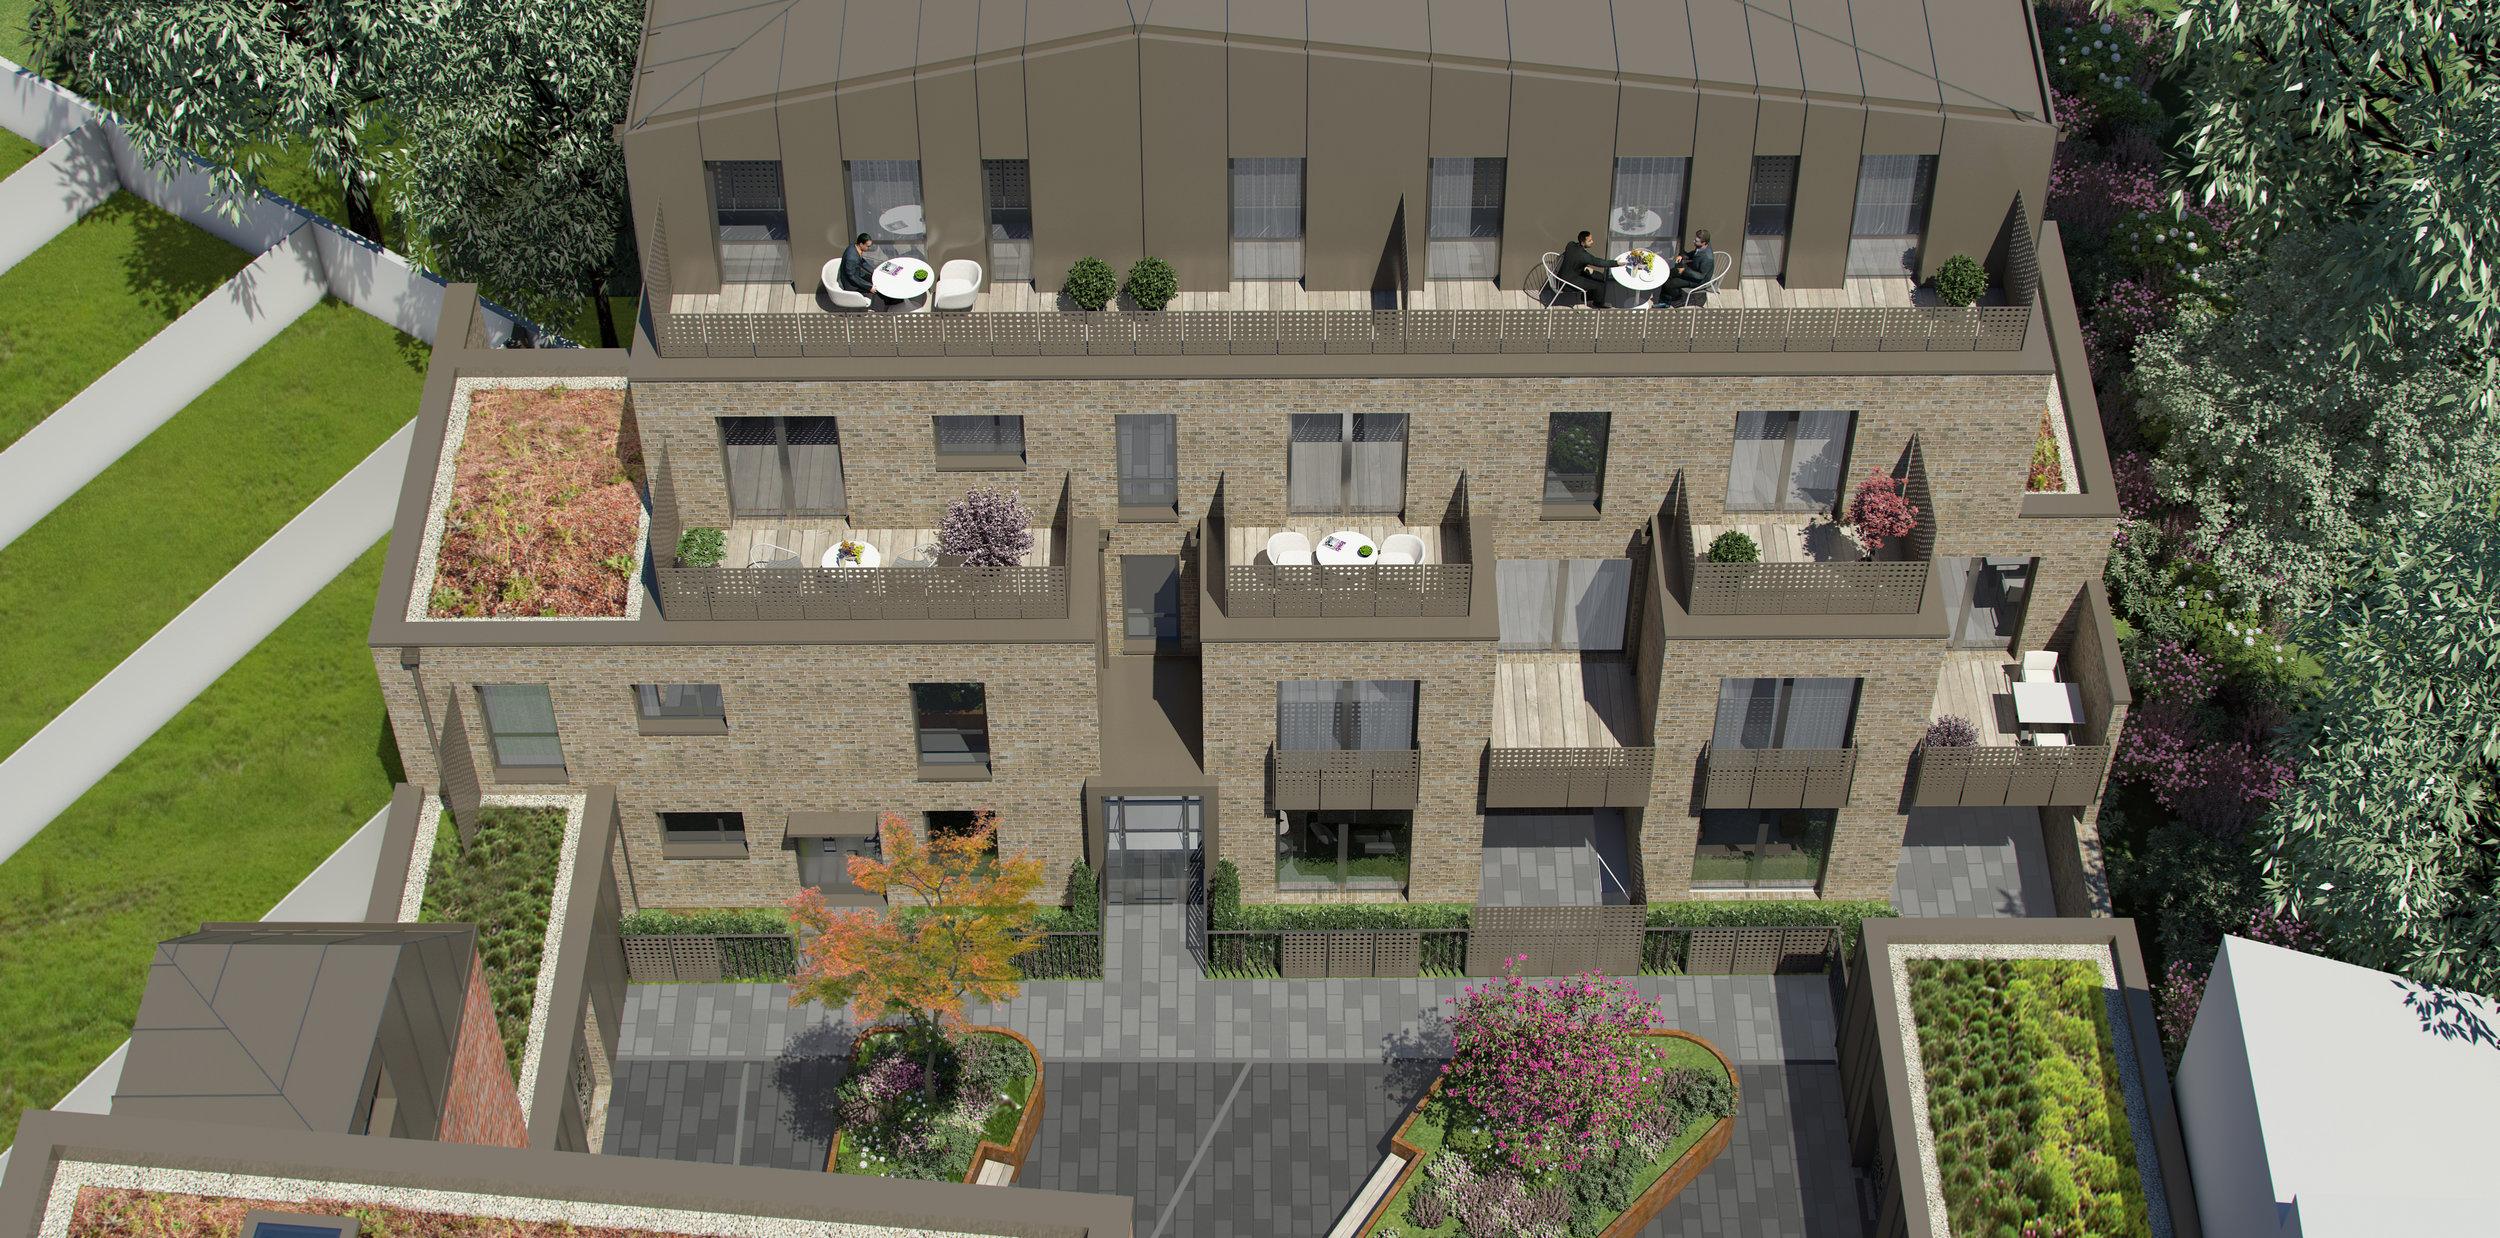 Balaam Street    Residential + Regeneration - Plaistow, Newham